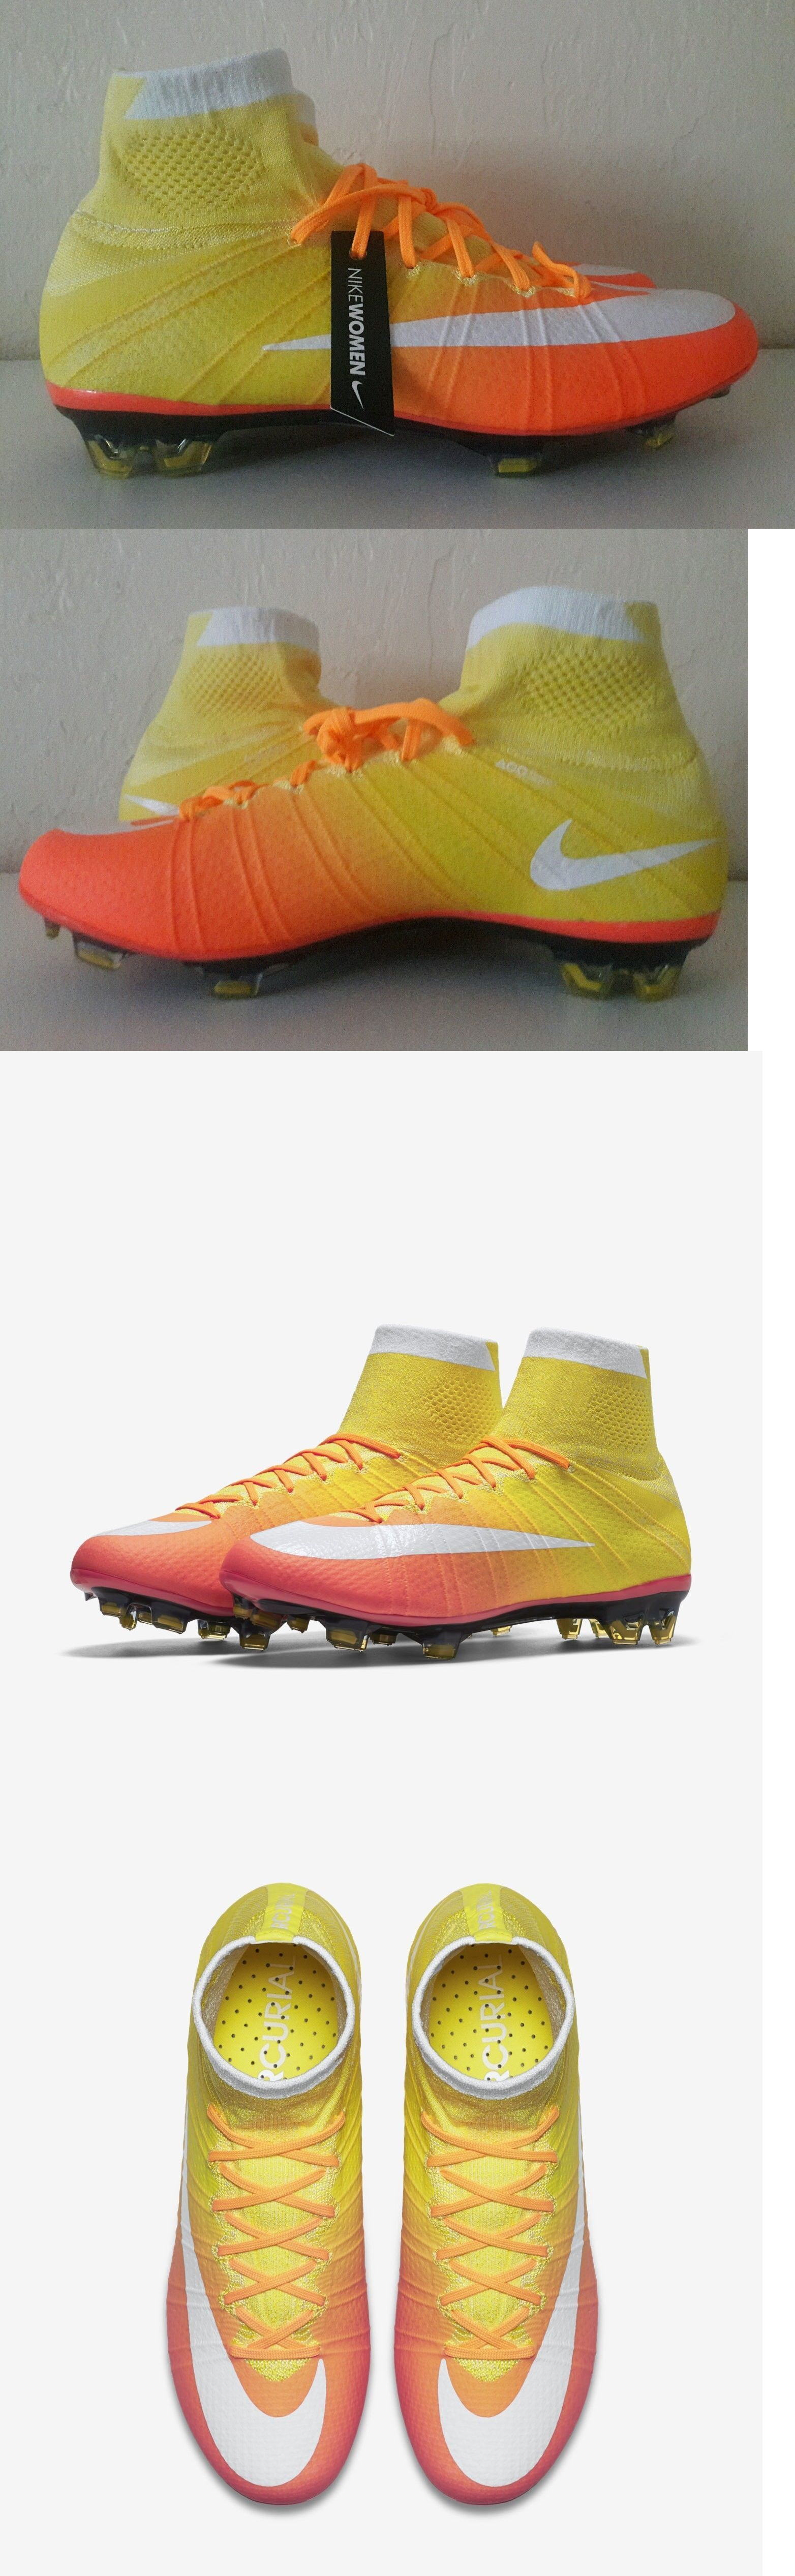 Women 159176: Nike Mercurial Superfly